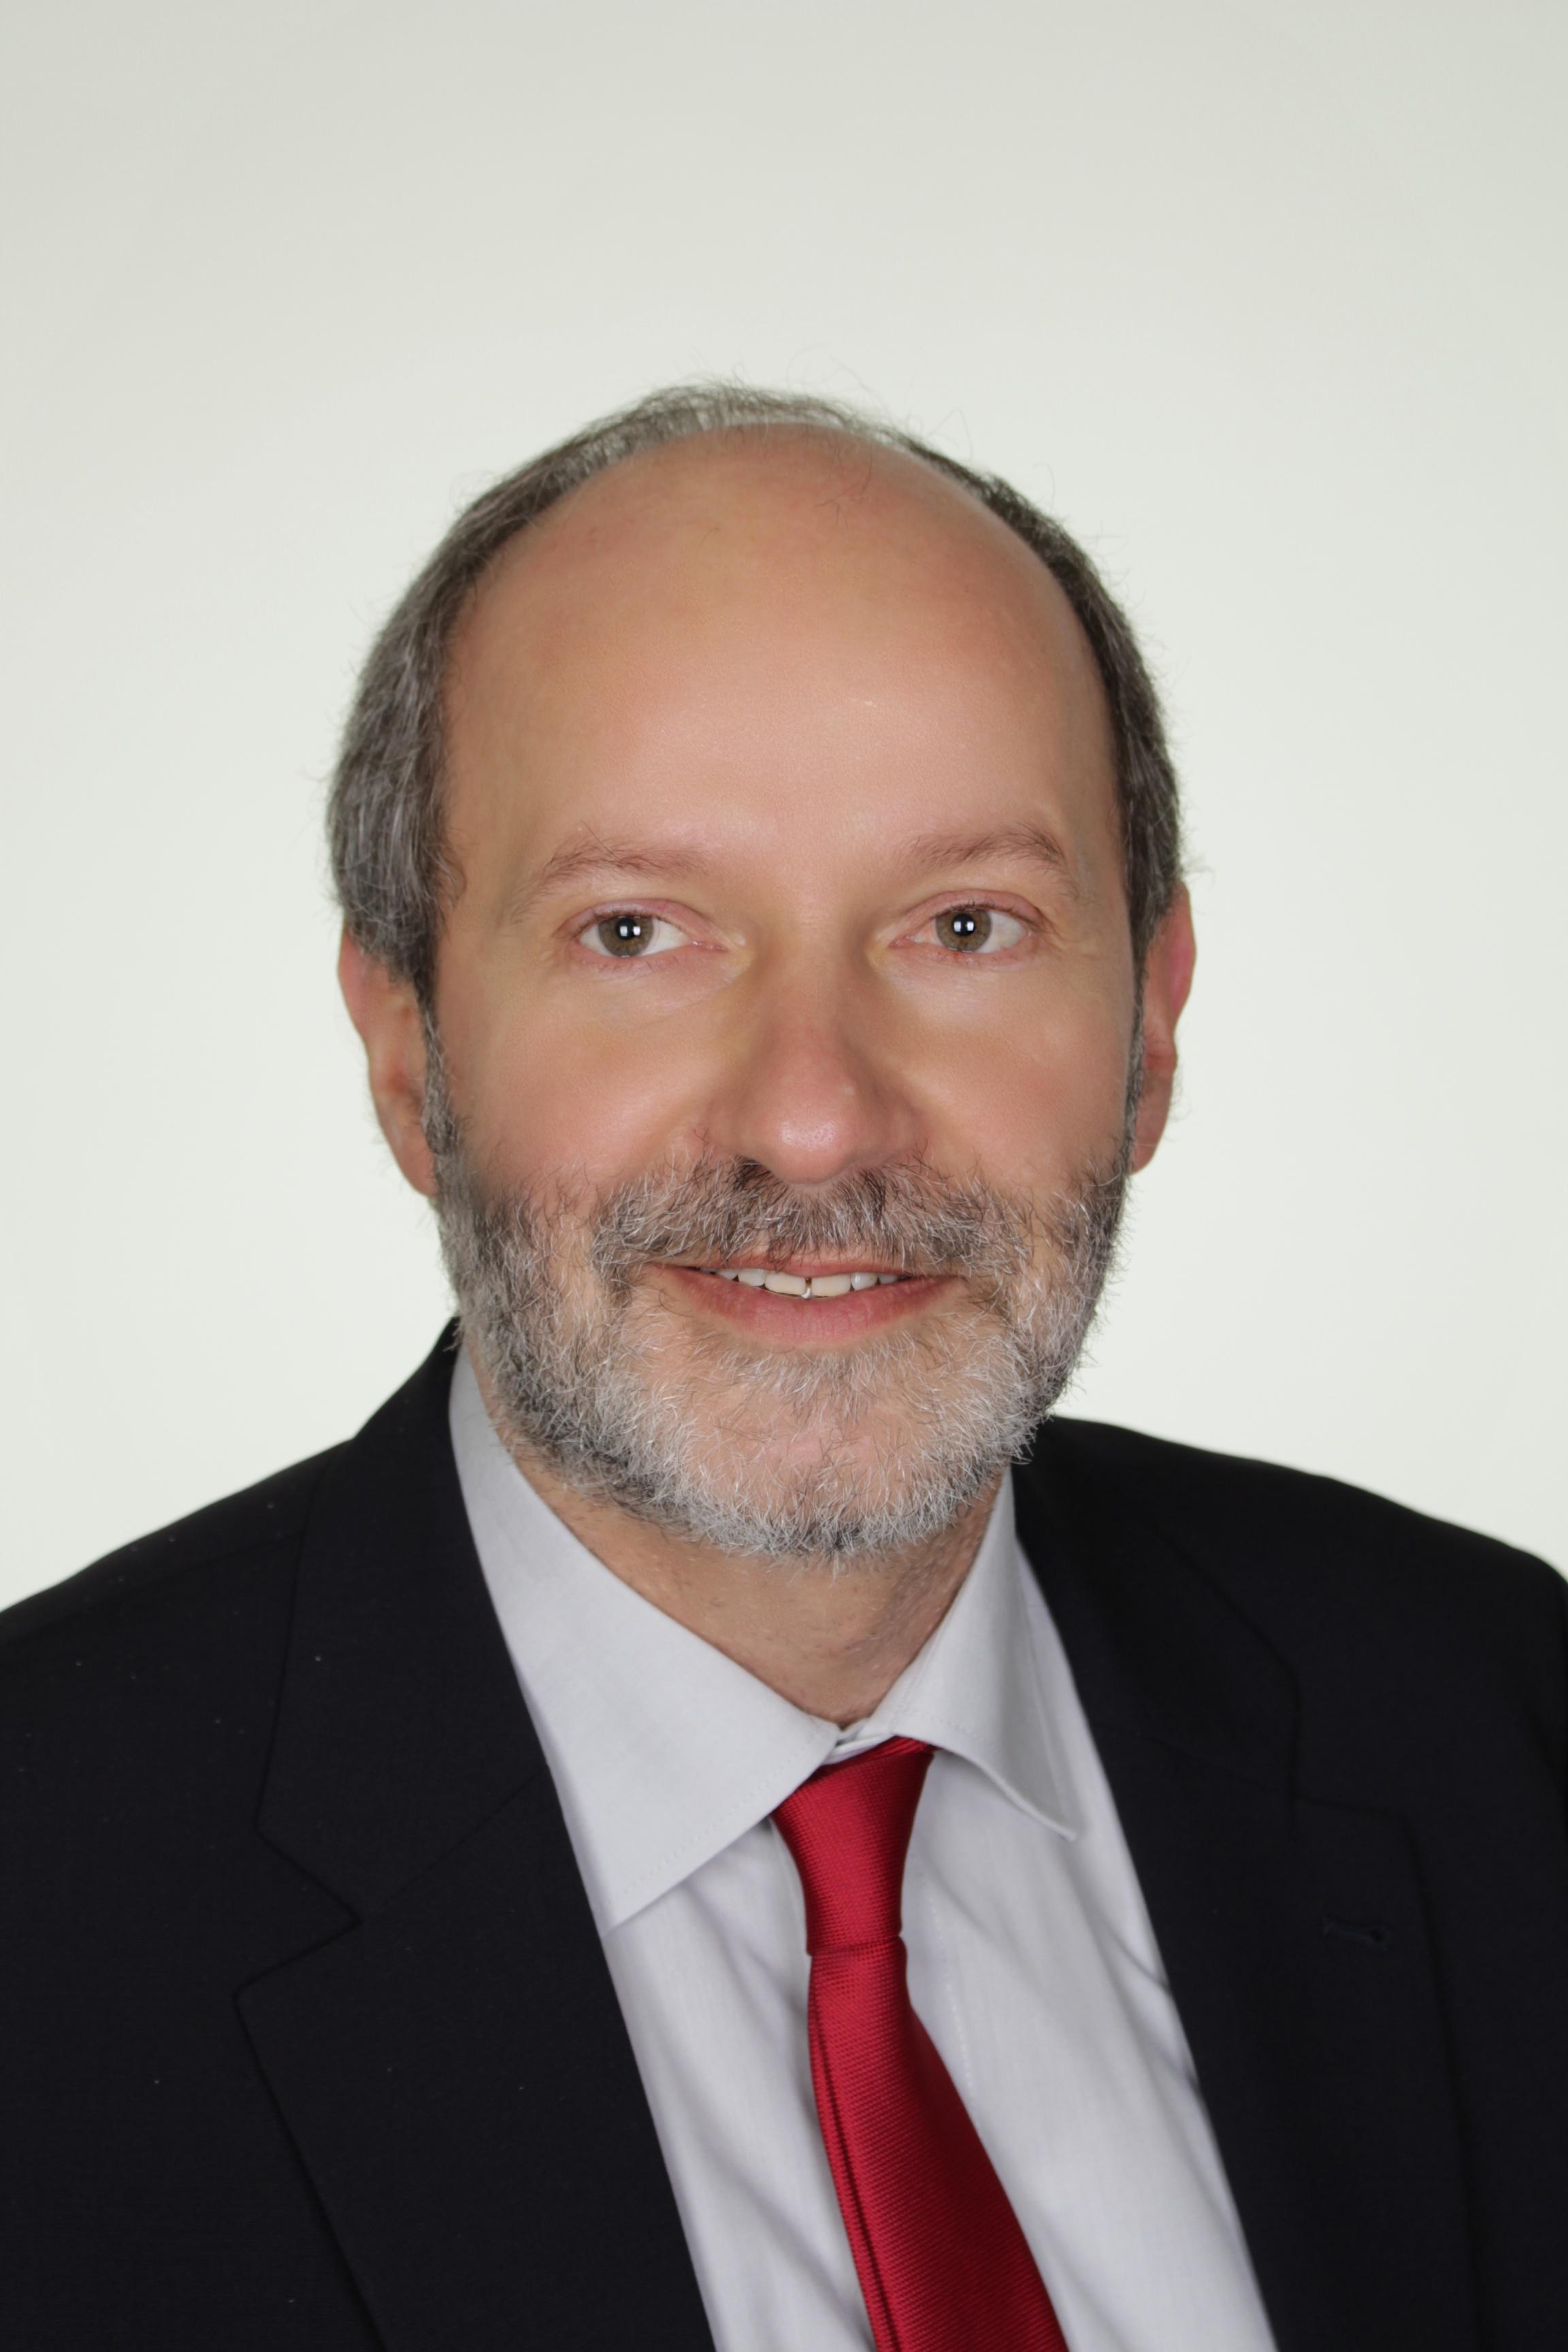 Prof. univ. dr. András Balogh